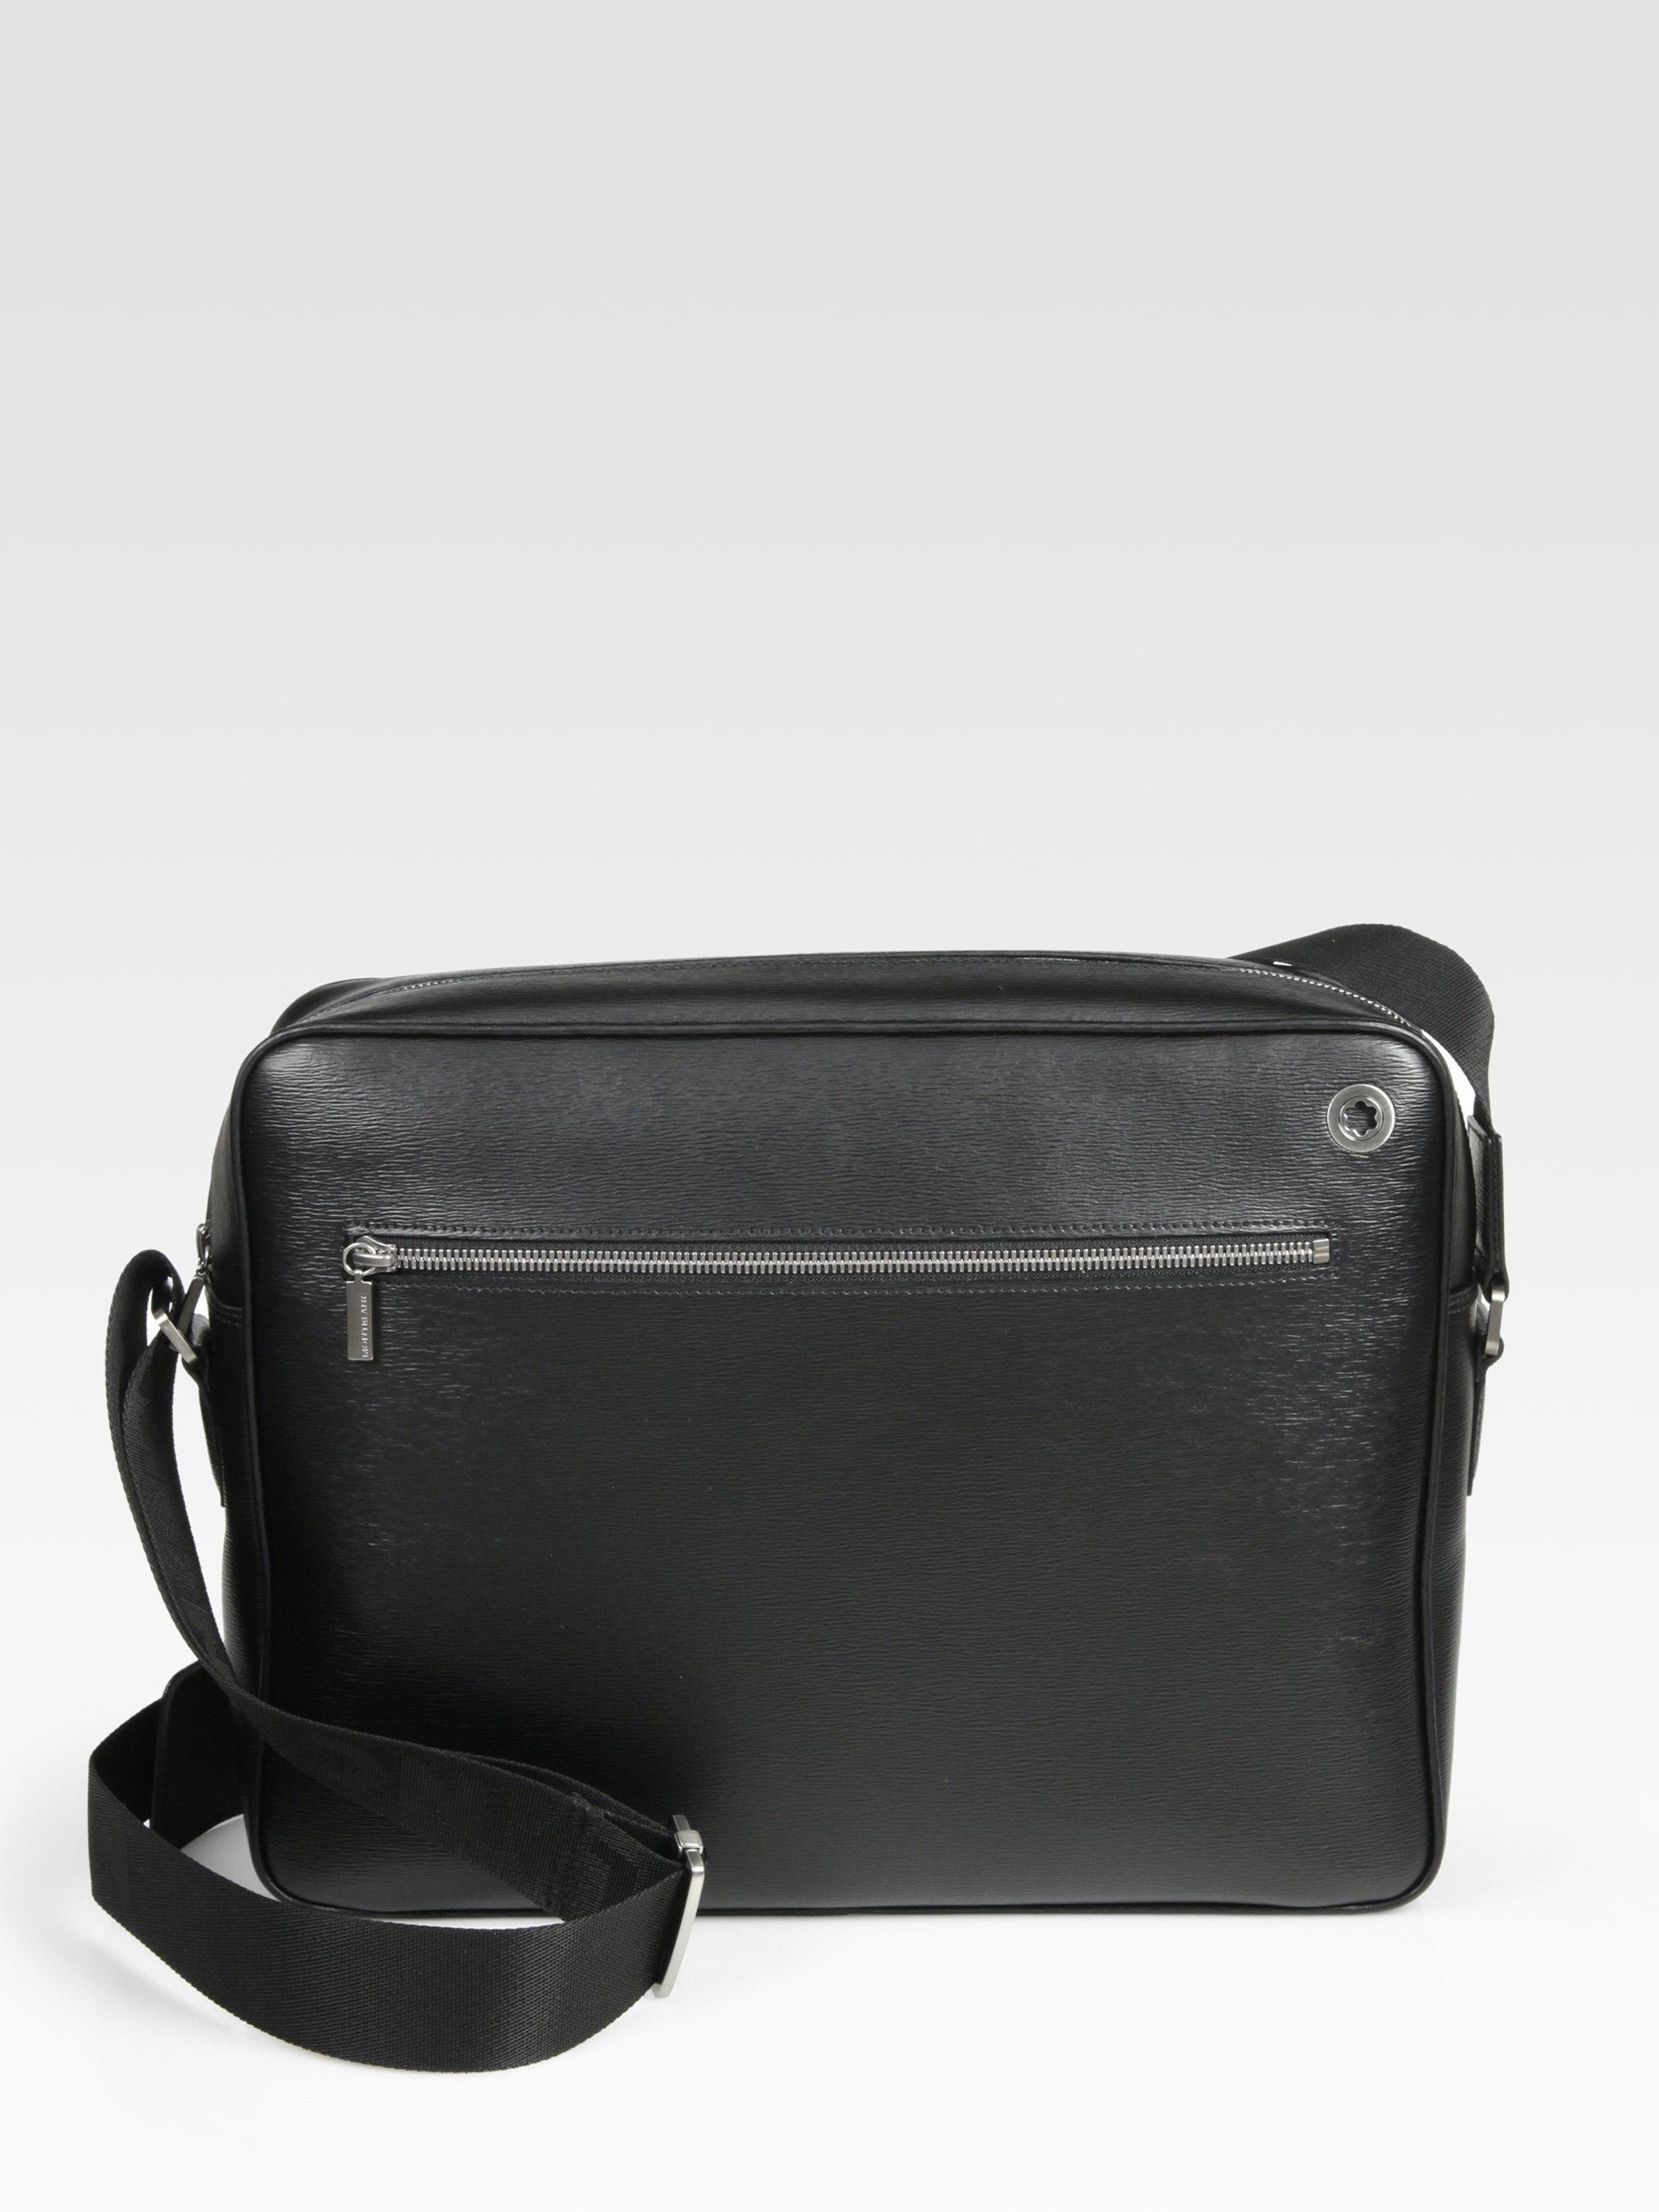 Lyst Montblanc Leather City Bag In Black For Men